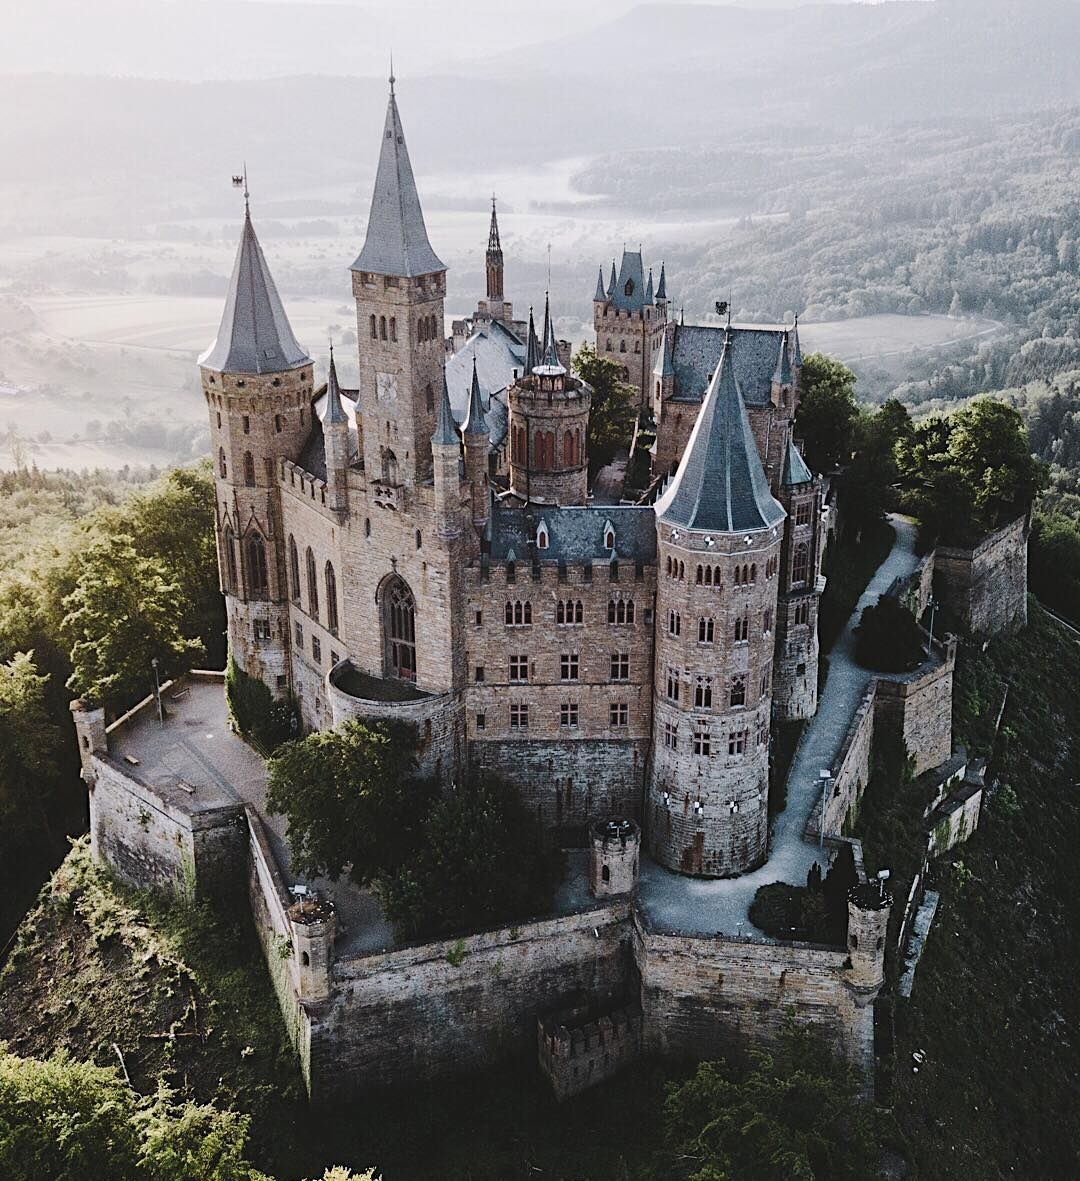 Castillo De Hohenzollern Monte Hohenzollern Hechingen In 2020 Hohenzollern Castle Germany Castles Castle